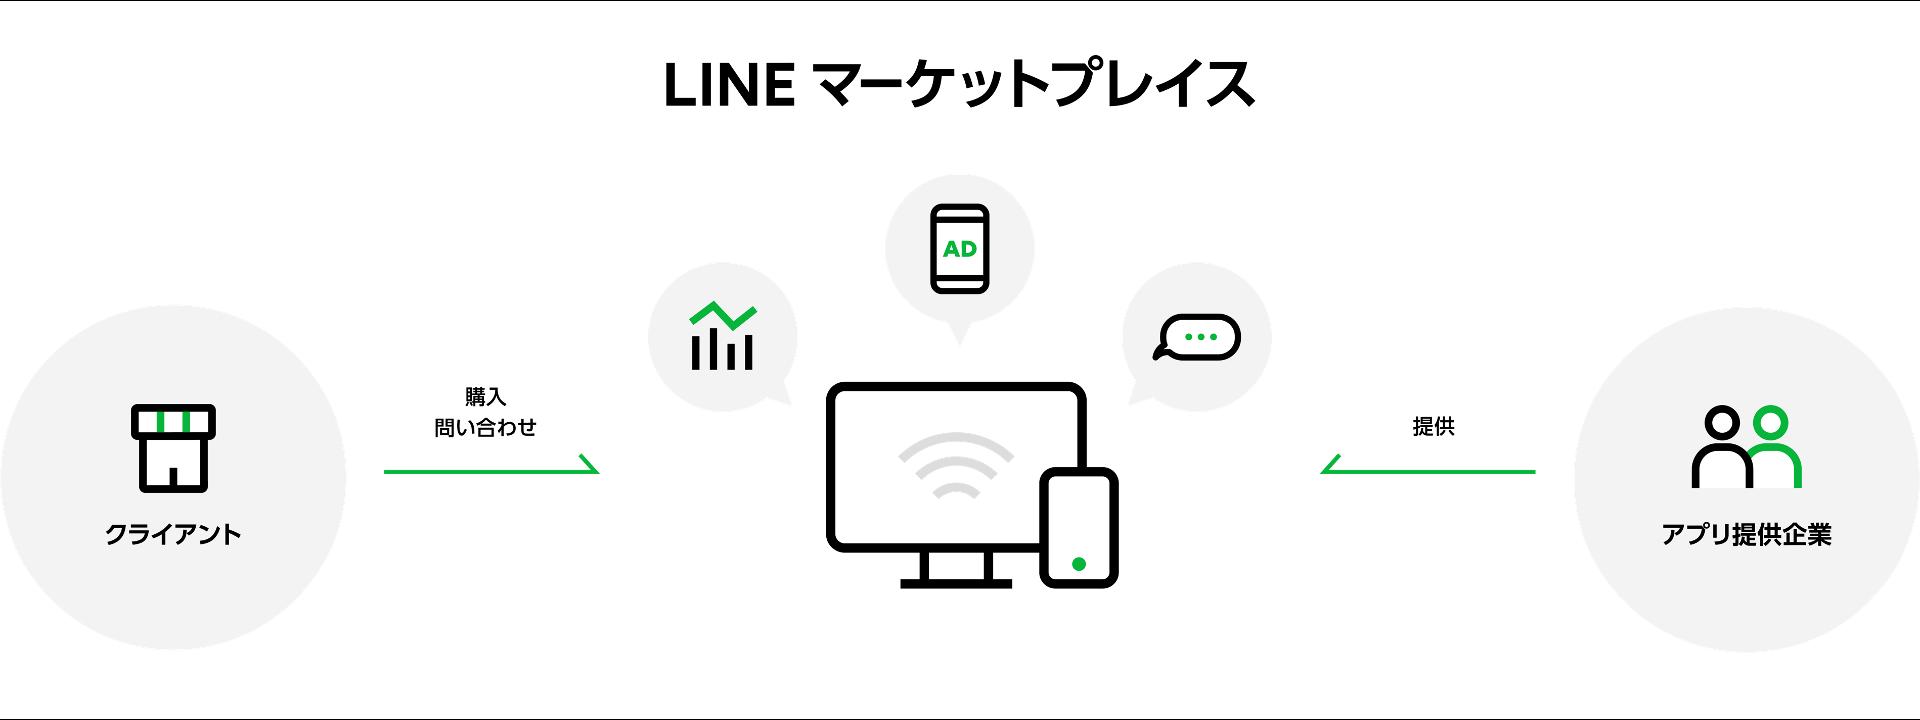 LINEマーケットプレイス_概念図